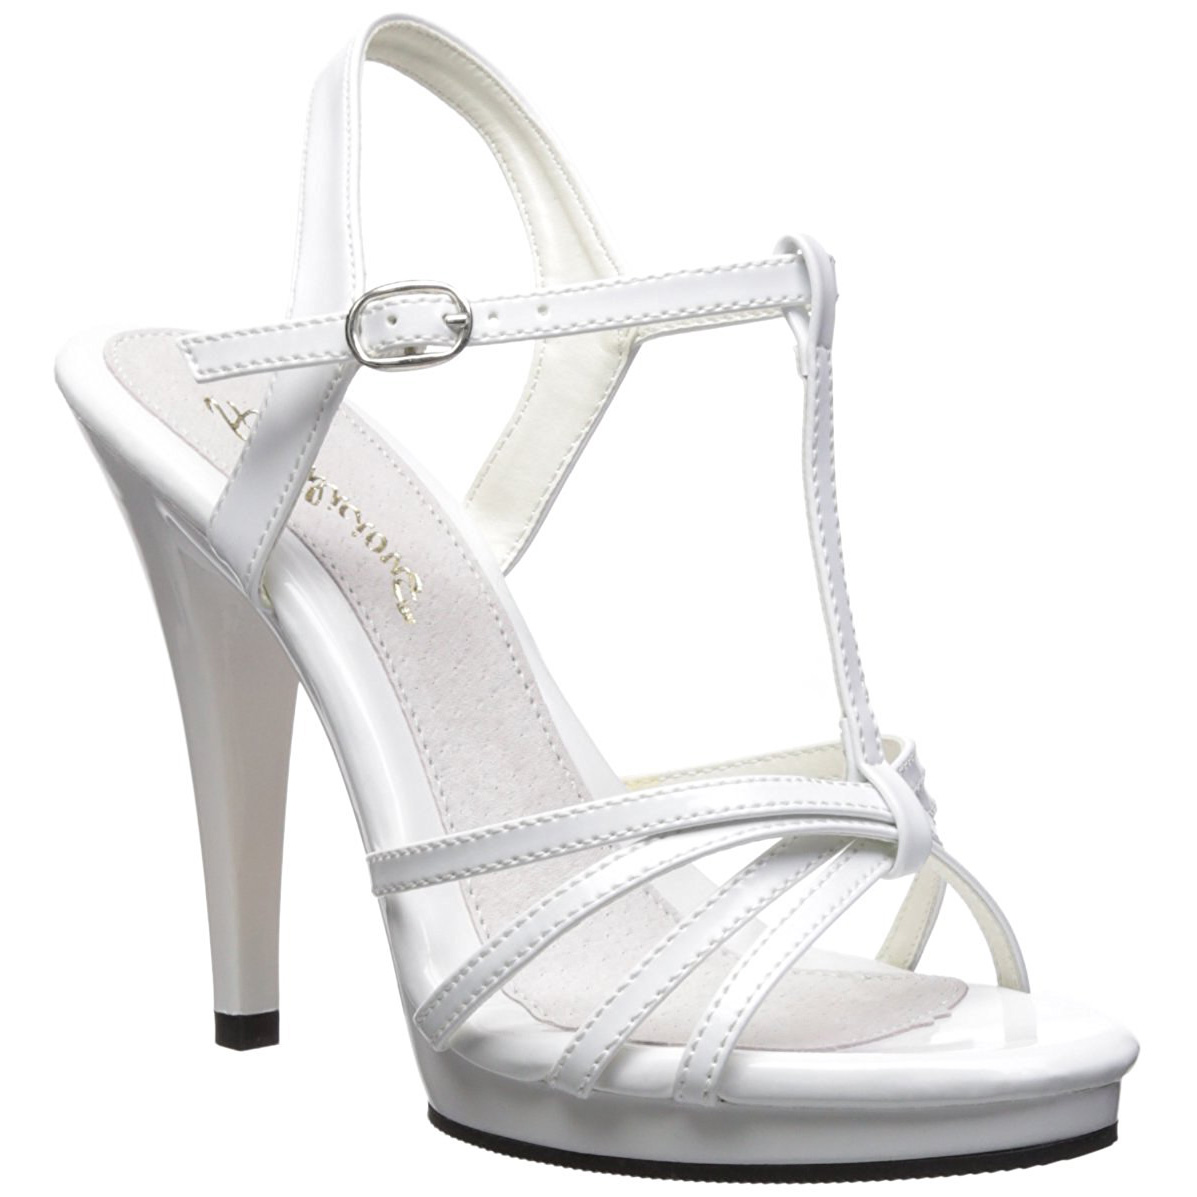 Bianco Donna 12 Con Cm Vernice 420 Ecdxorb Tacco Sandali Flair VUzMpqS